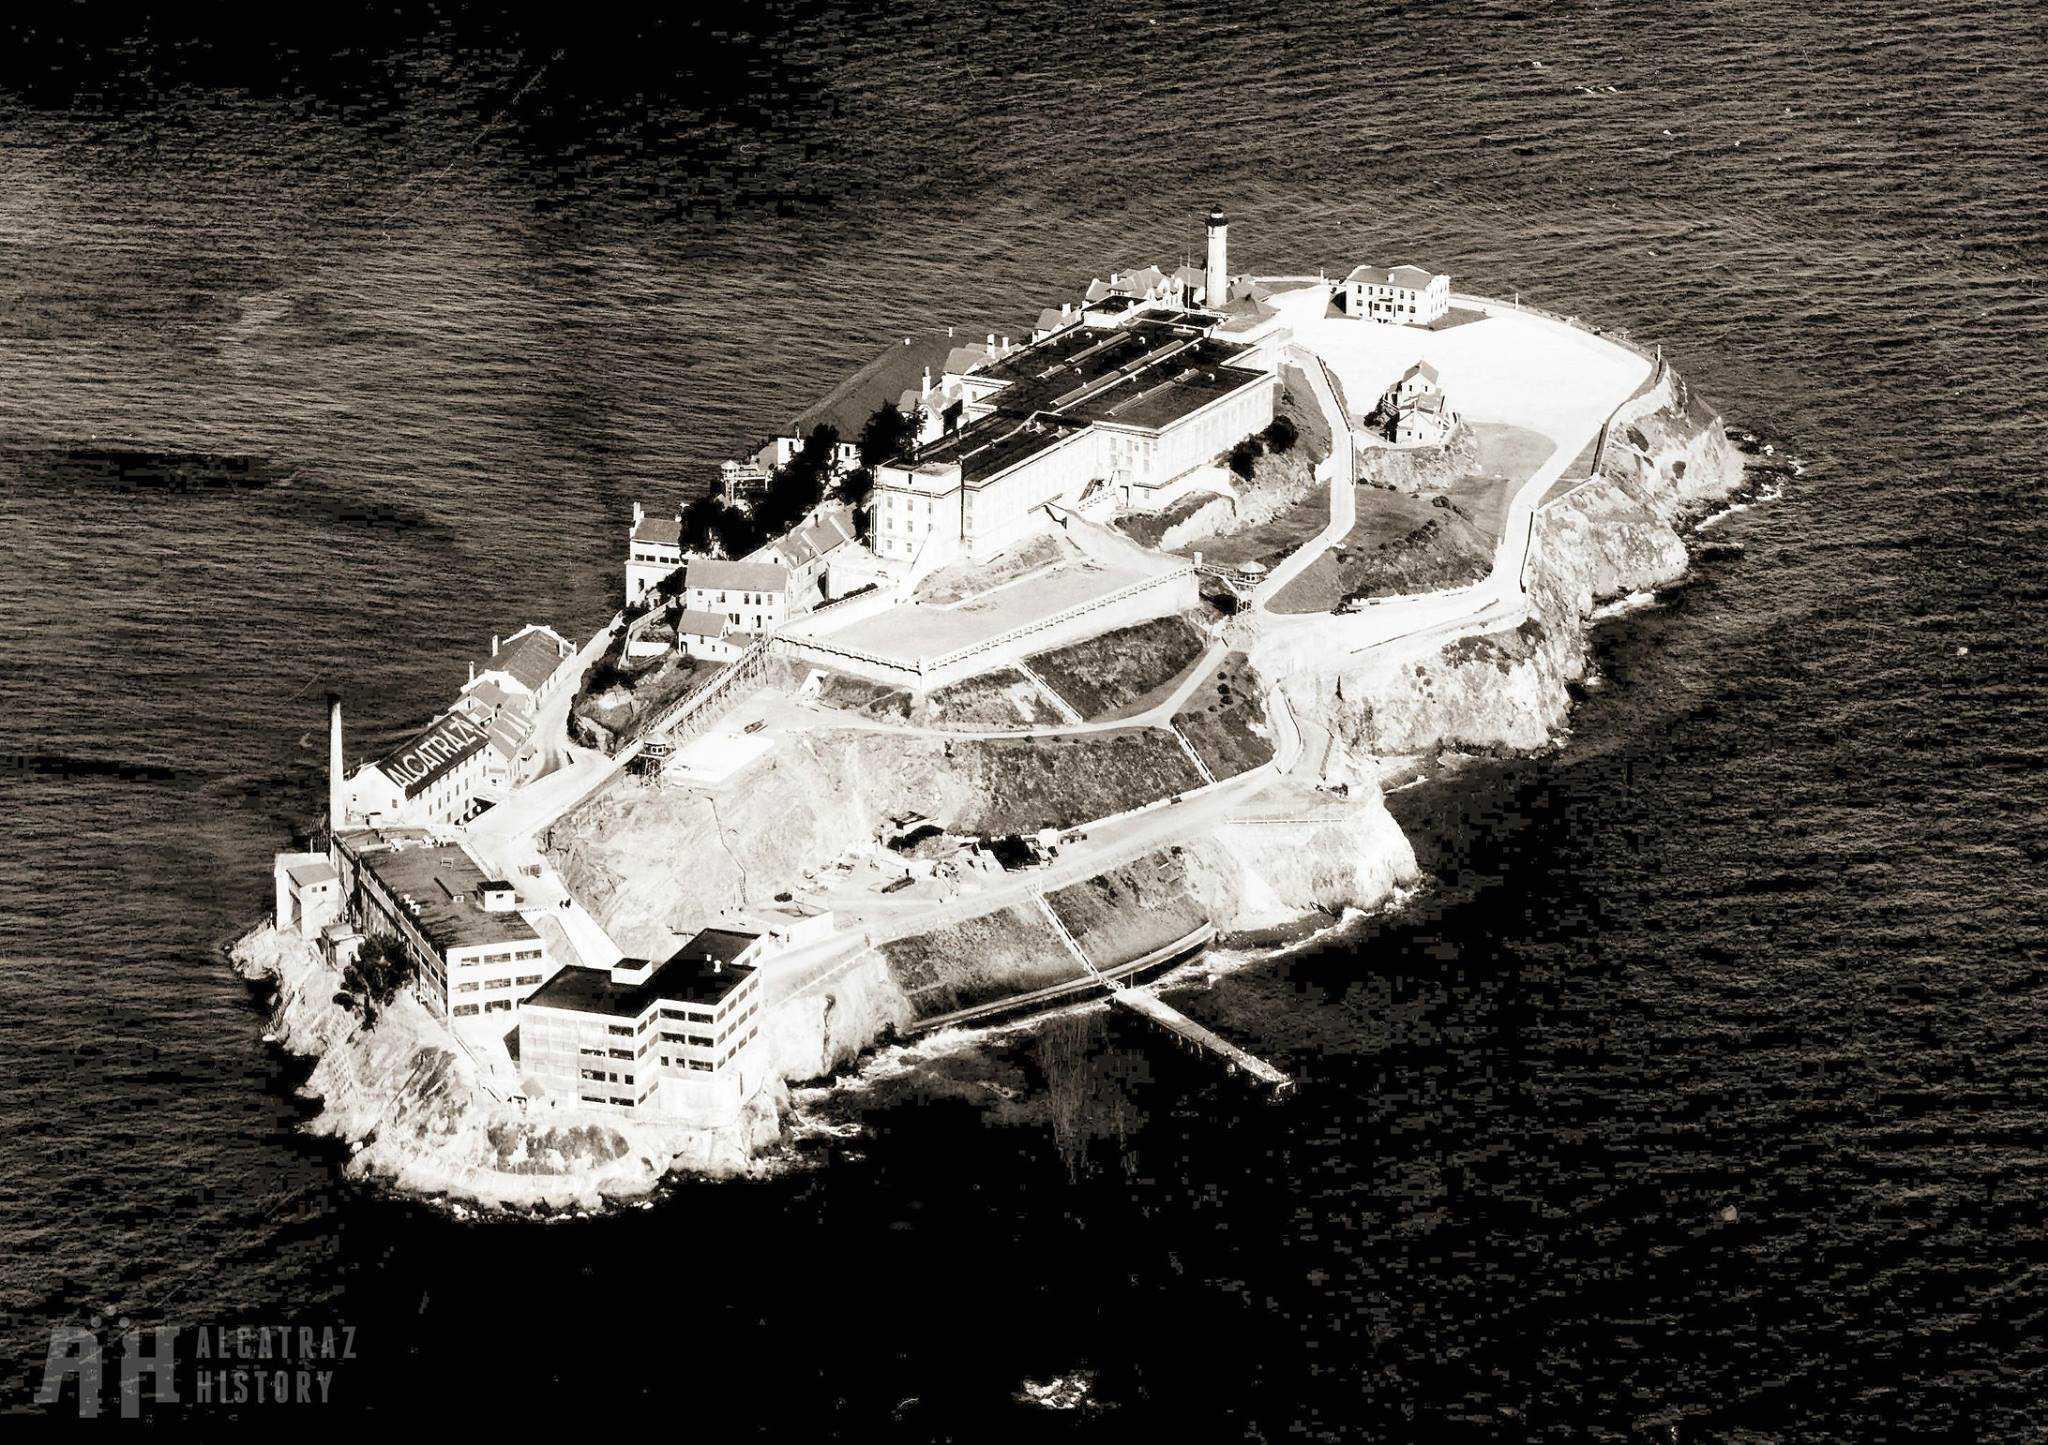 Alcatraz Island in 1934